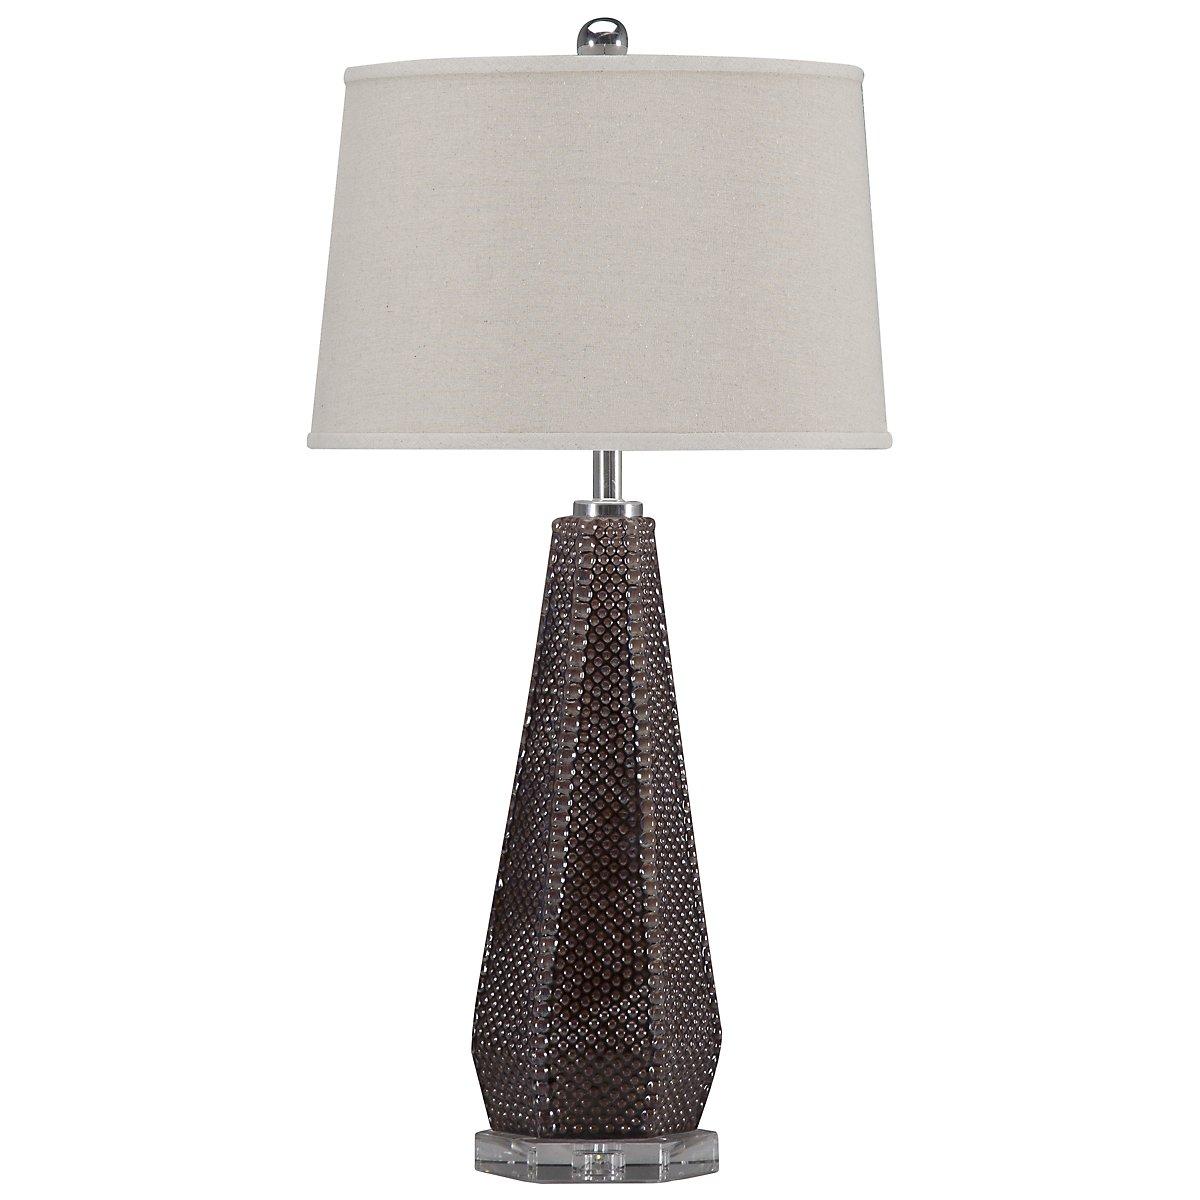 Pontius Dark Taupe Table Lamp